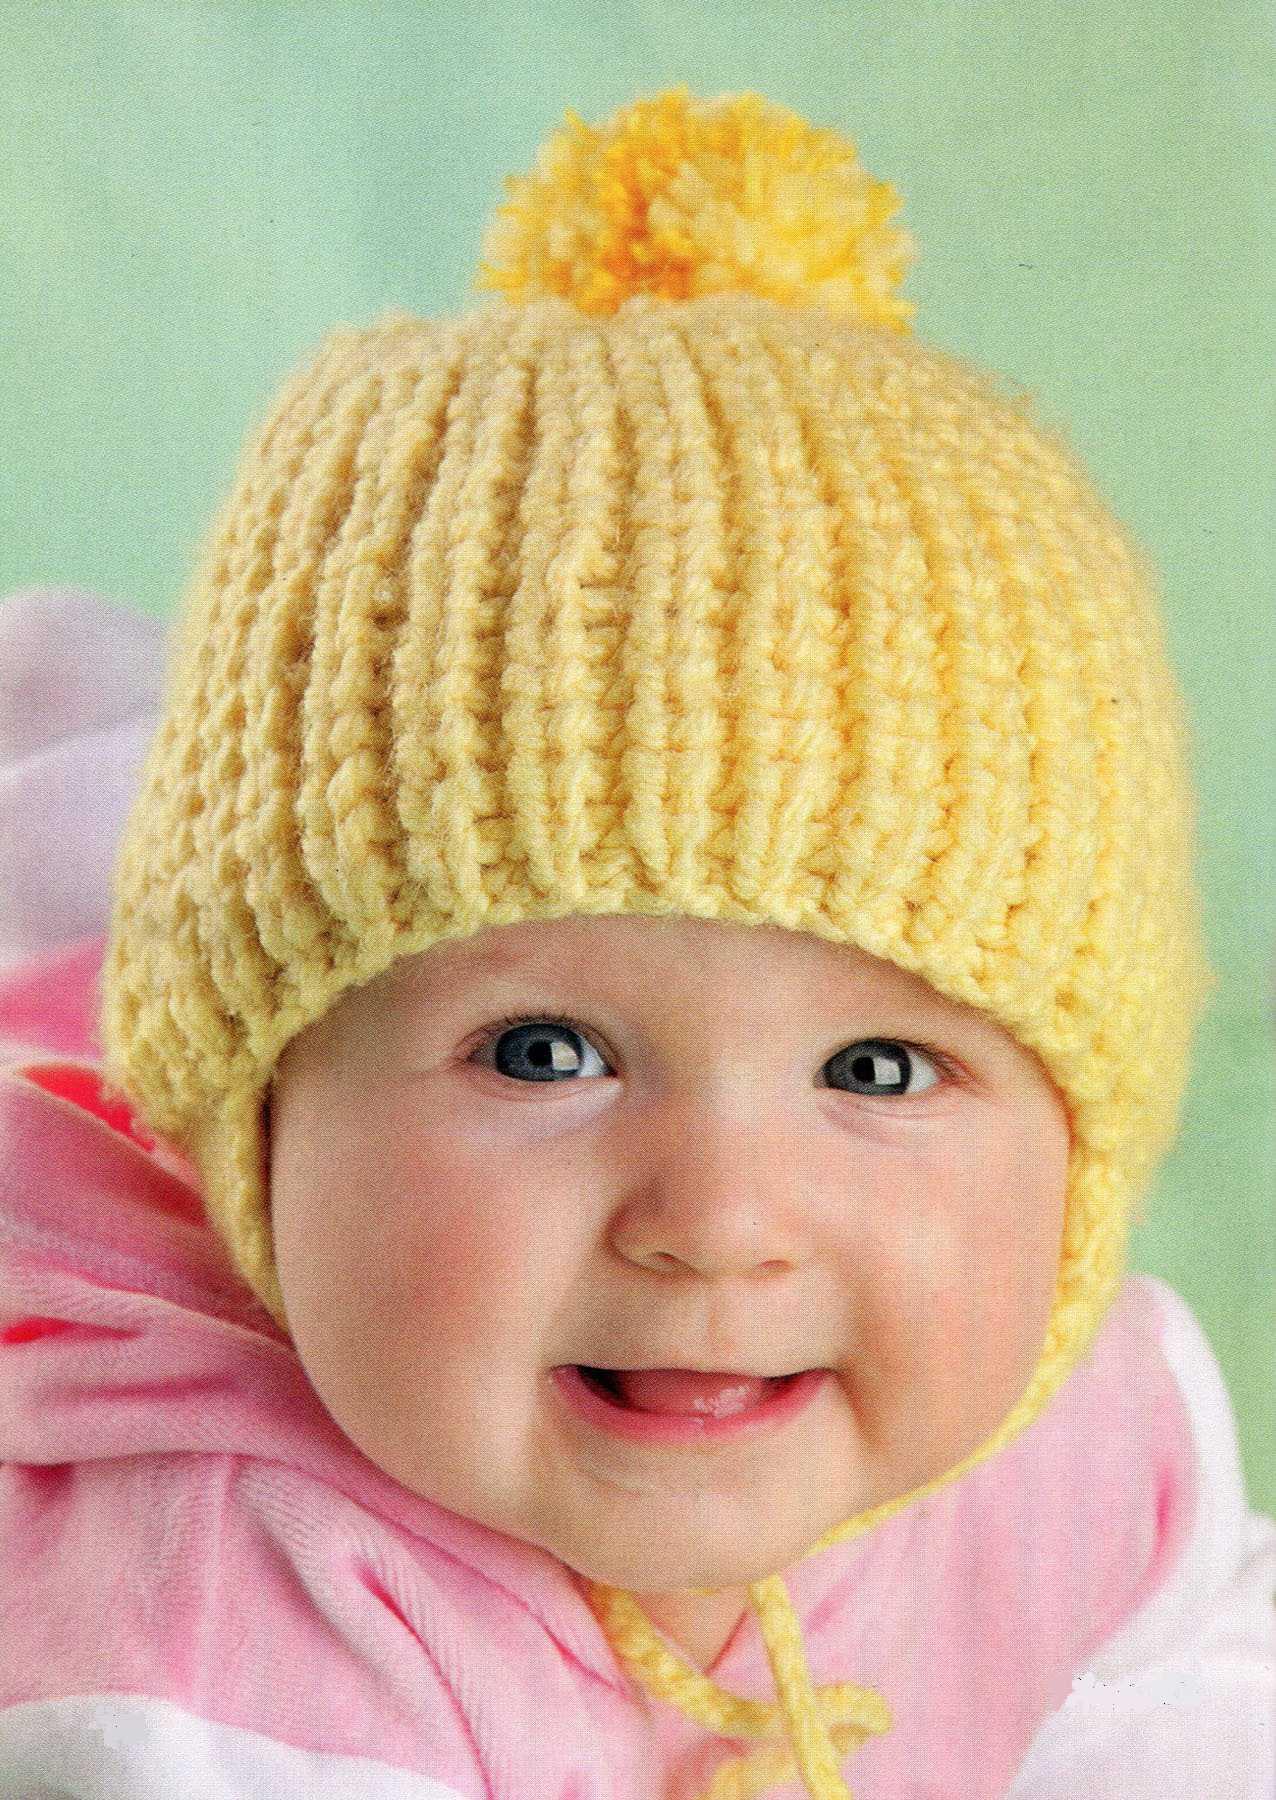 Шапочка-медвежонок...  Метки: вяжем на спицах, вязание для малышей шапочки, вязание малышам до года